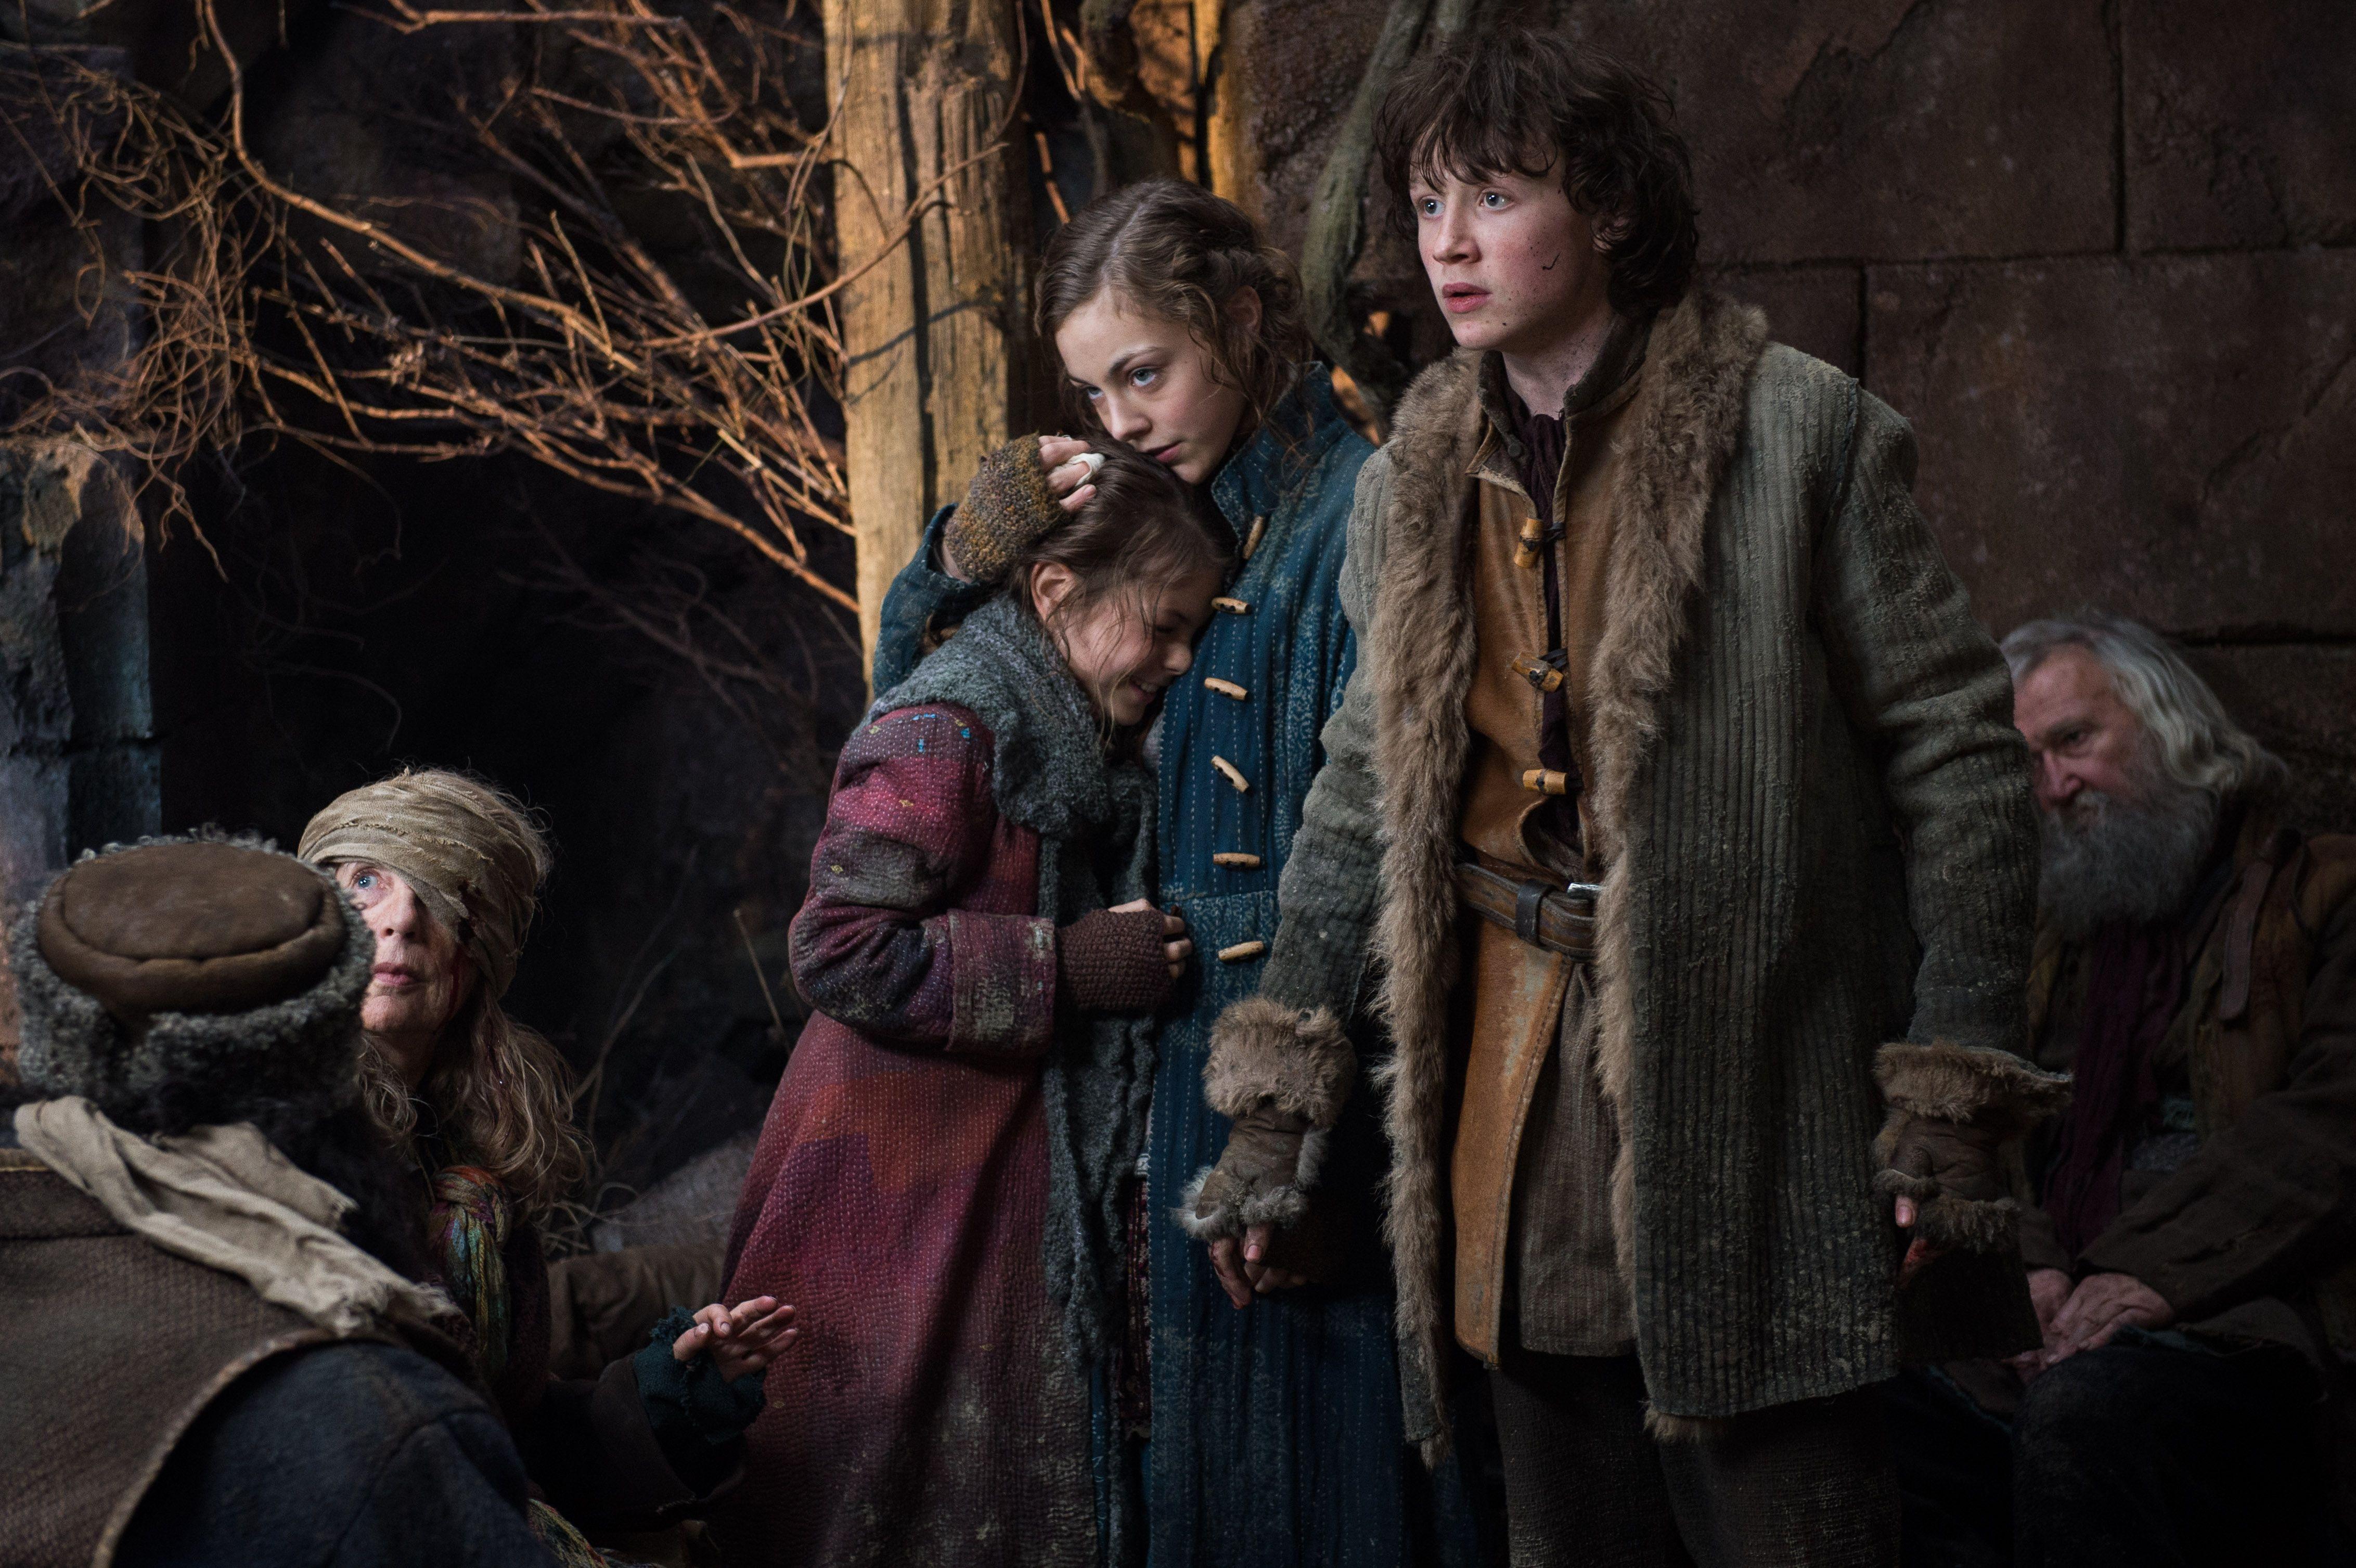 Bain, Sigrid, And Tilda, Children Of Bard The Bowman